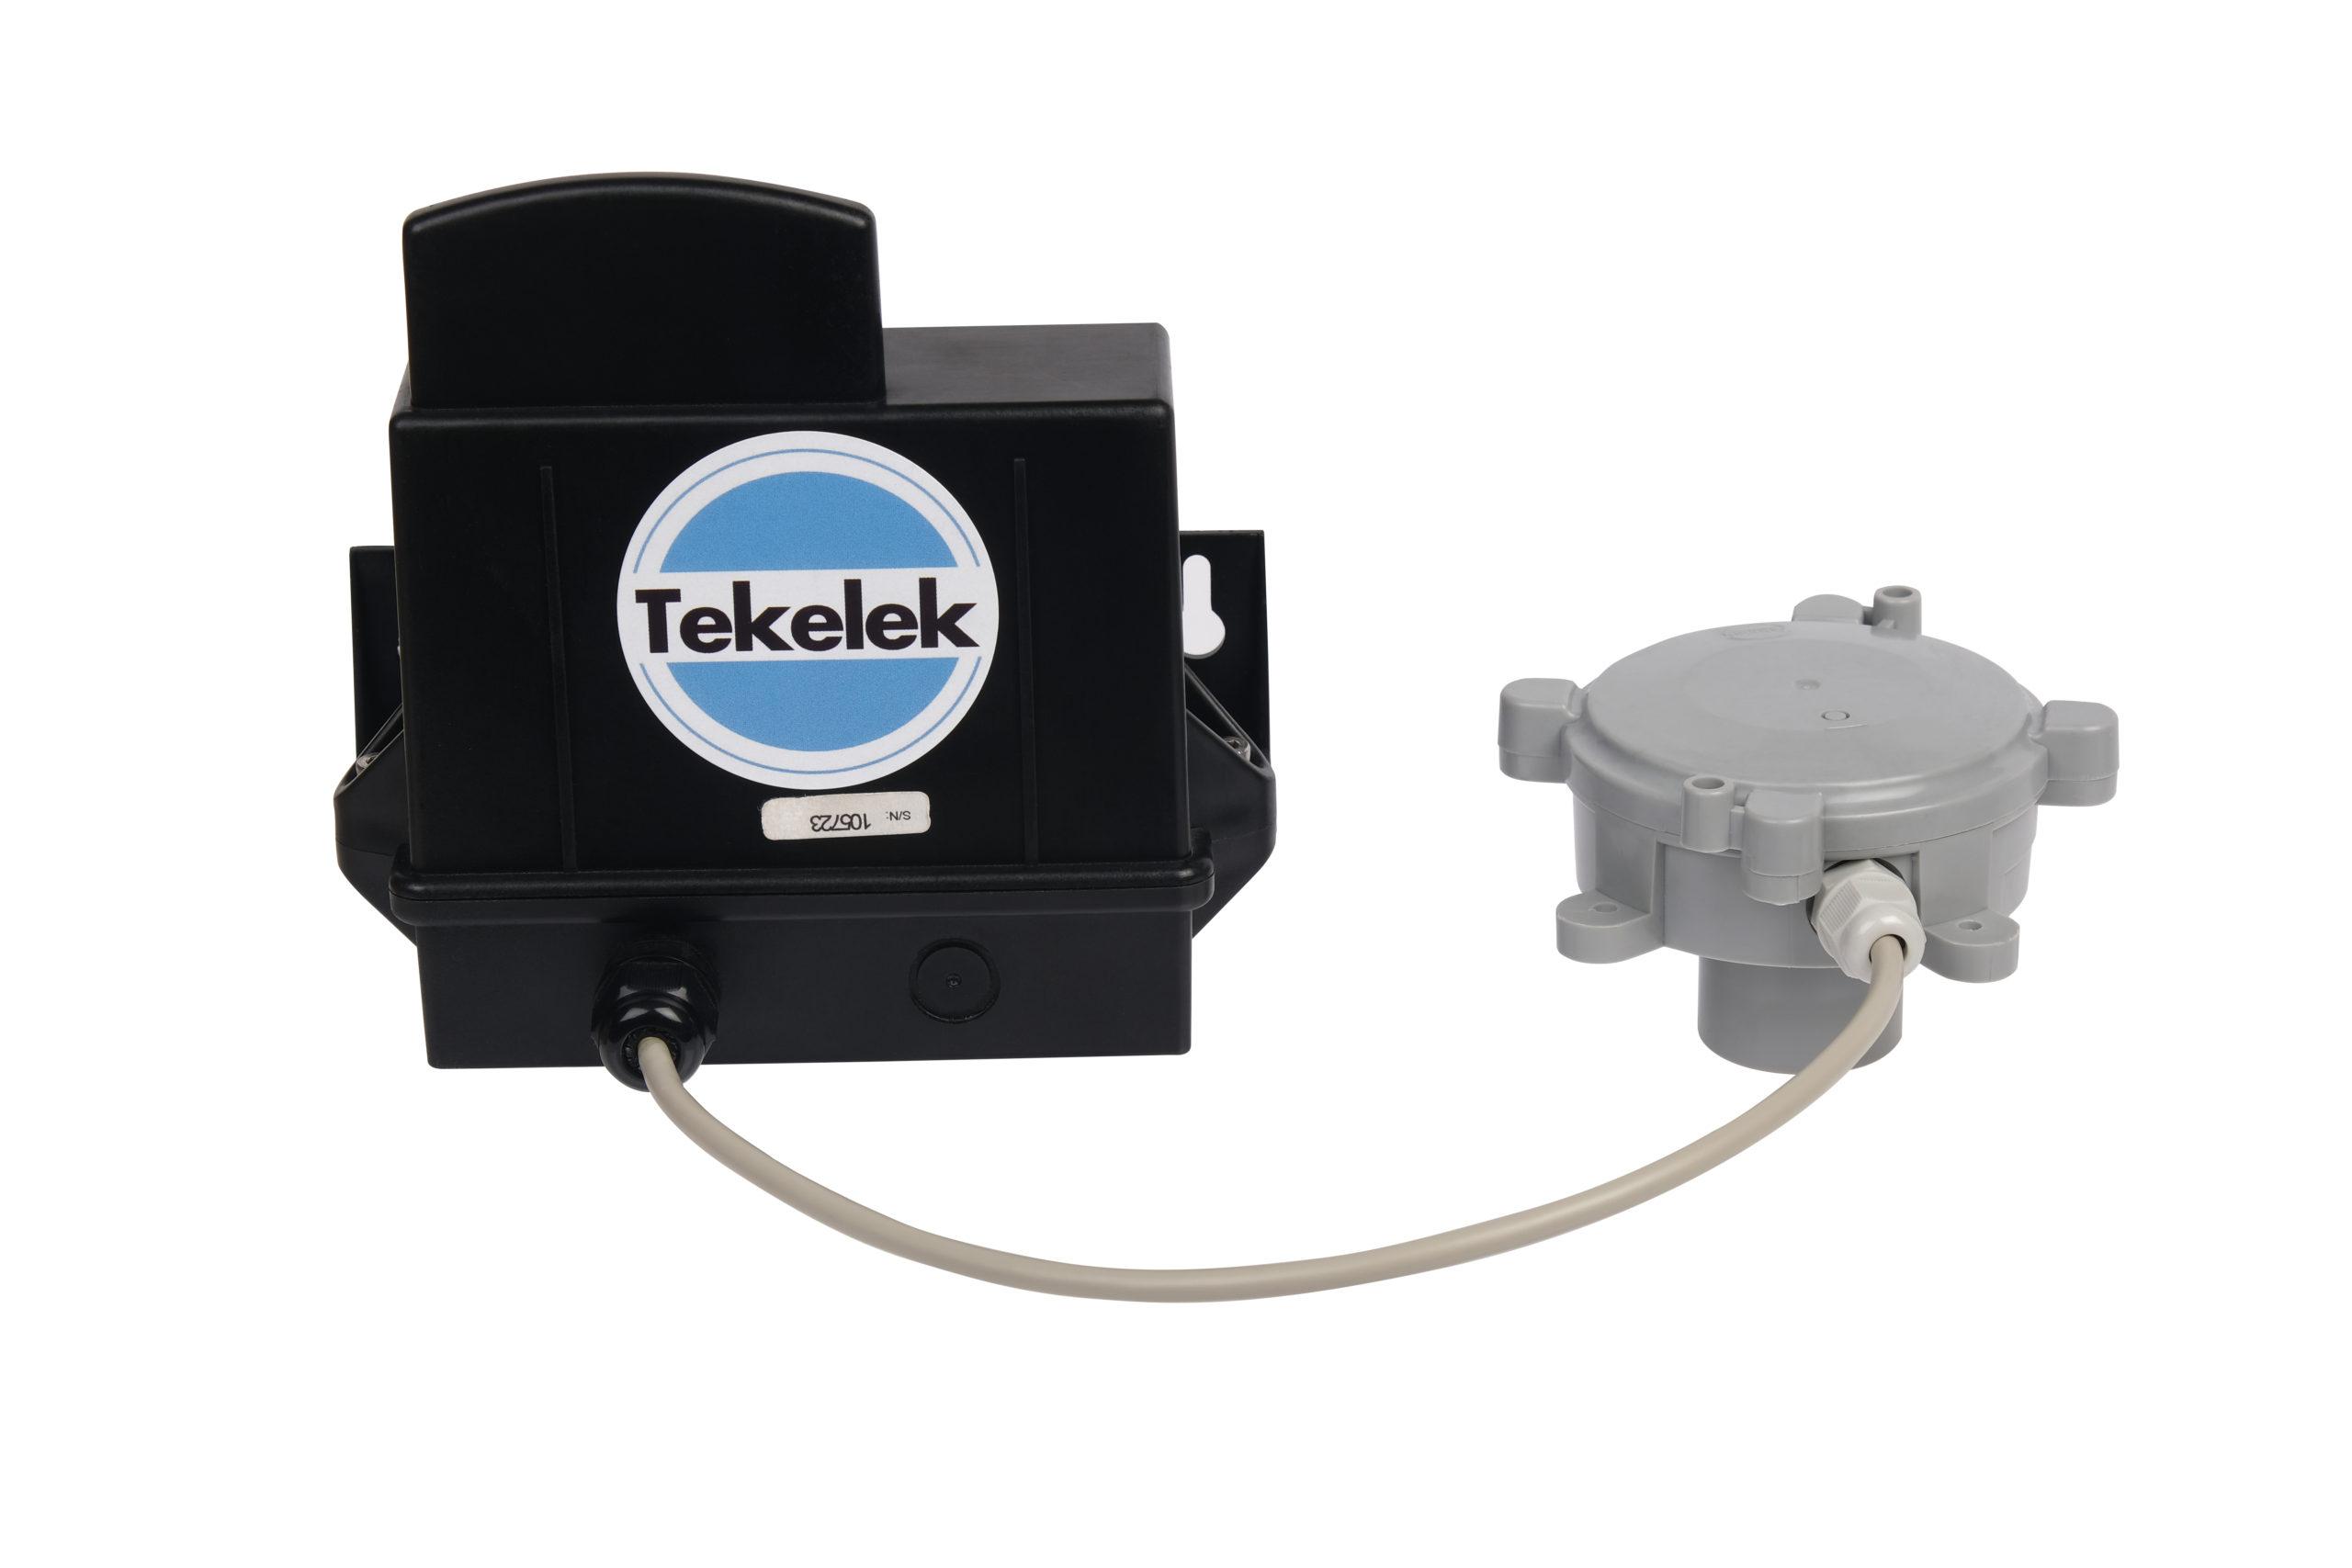 ATEX 4G LTE NB-IoT/CAT-M1 ultrasonic